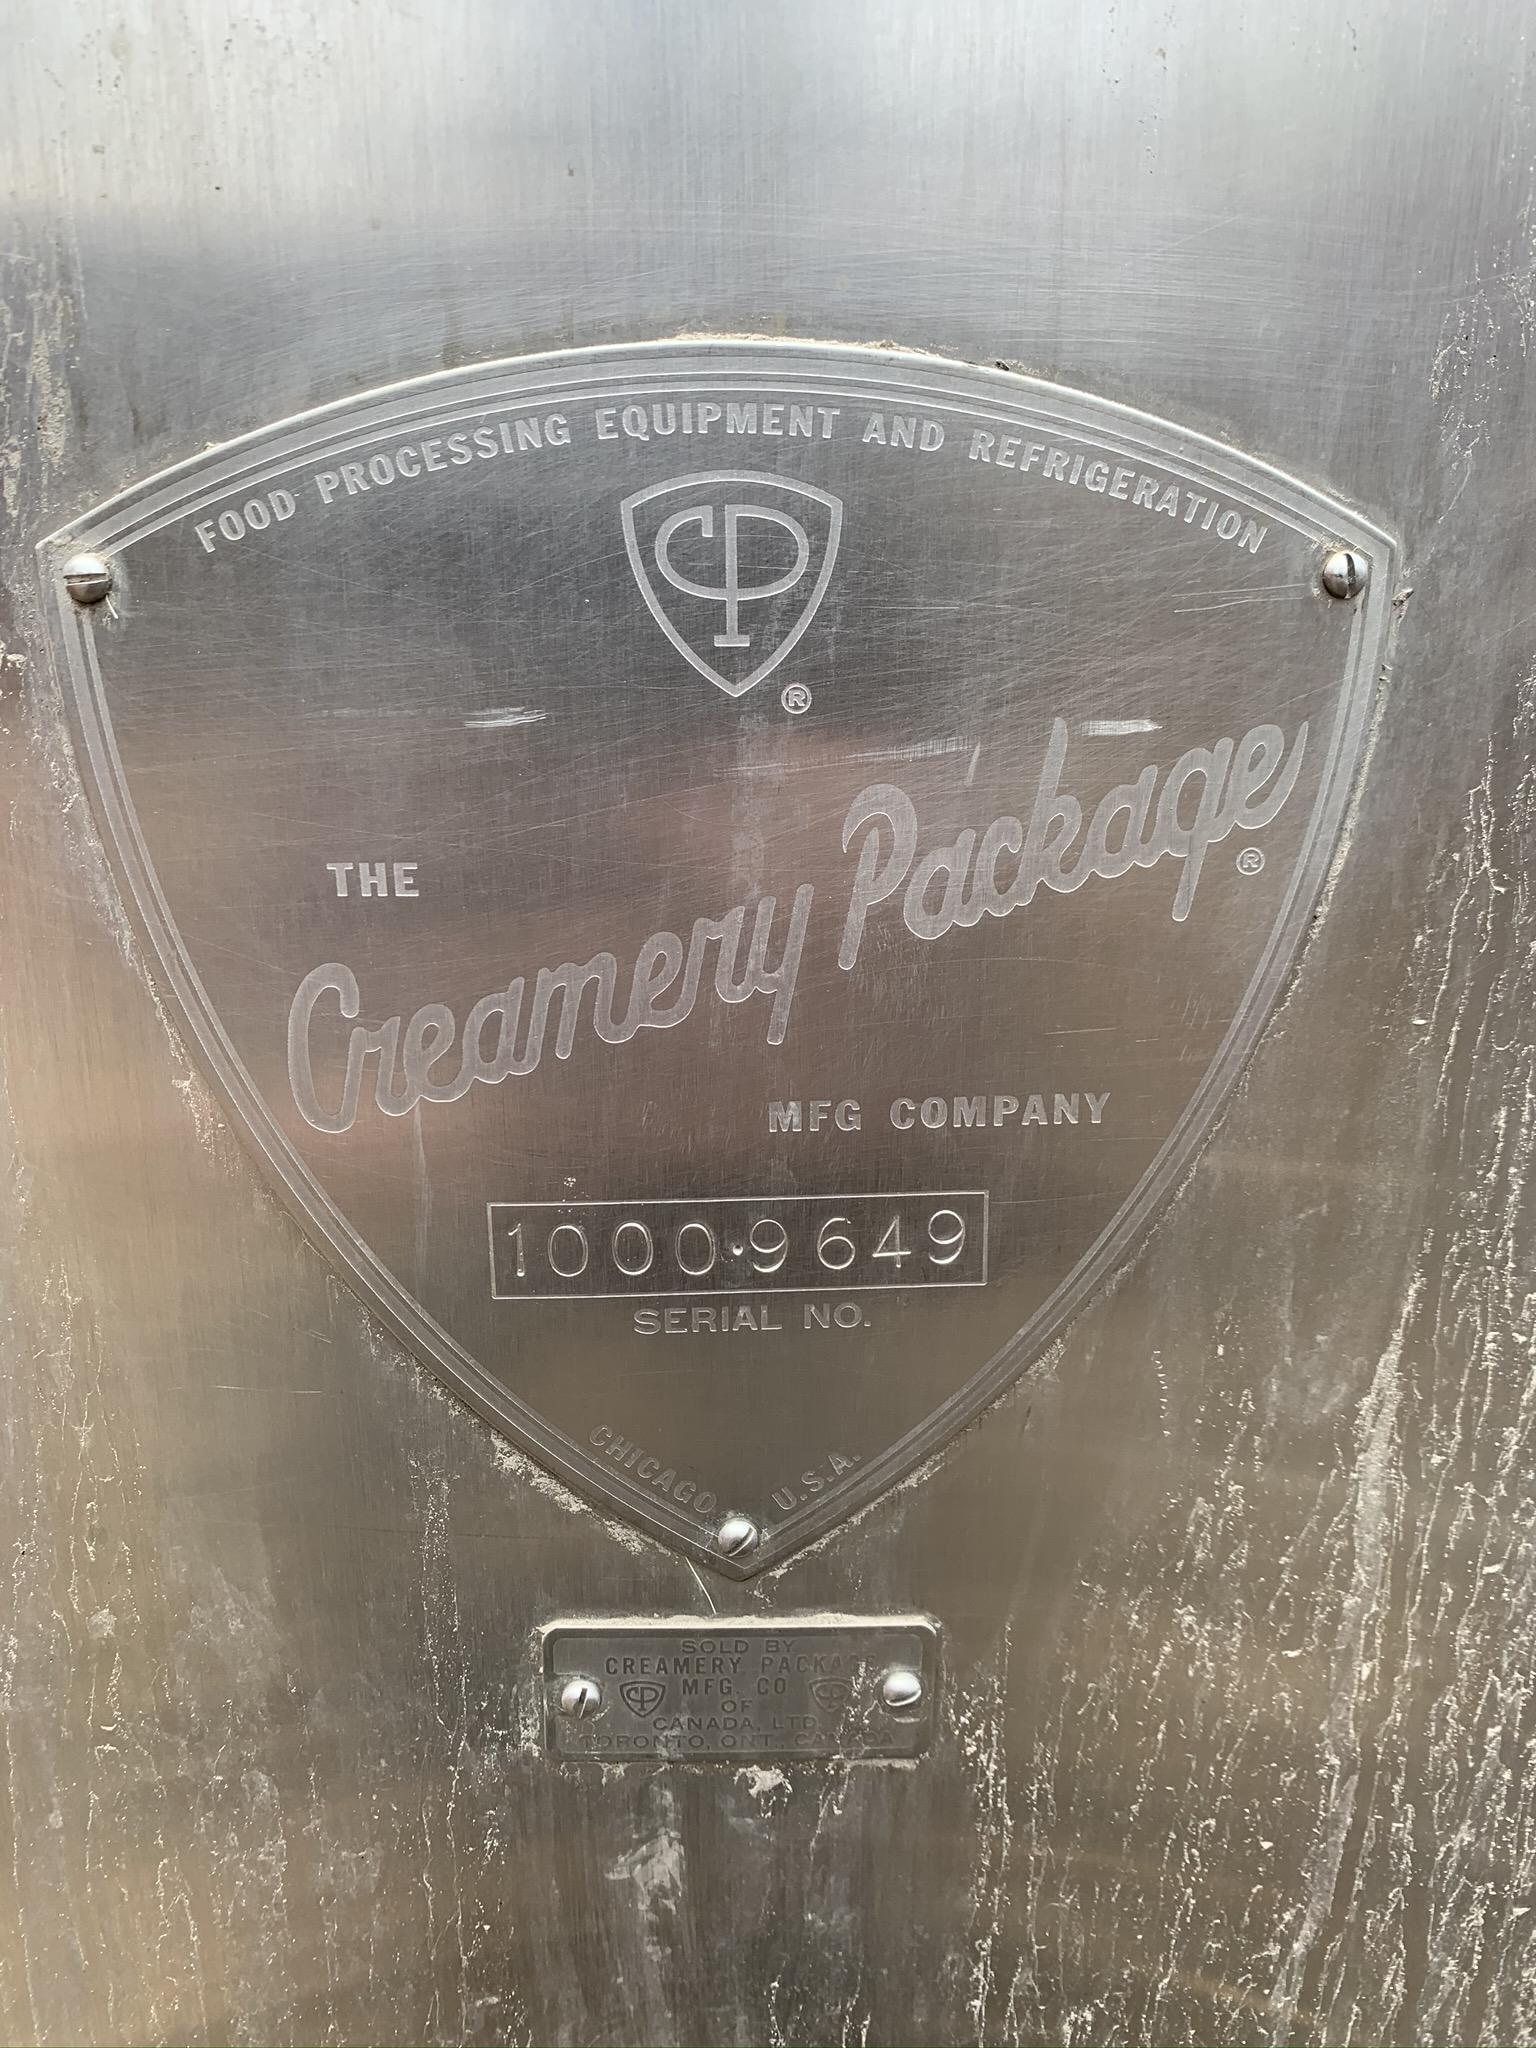 Pasteurisateur Creamery Package 5500 litres remis à neuf